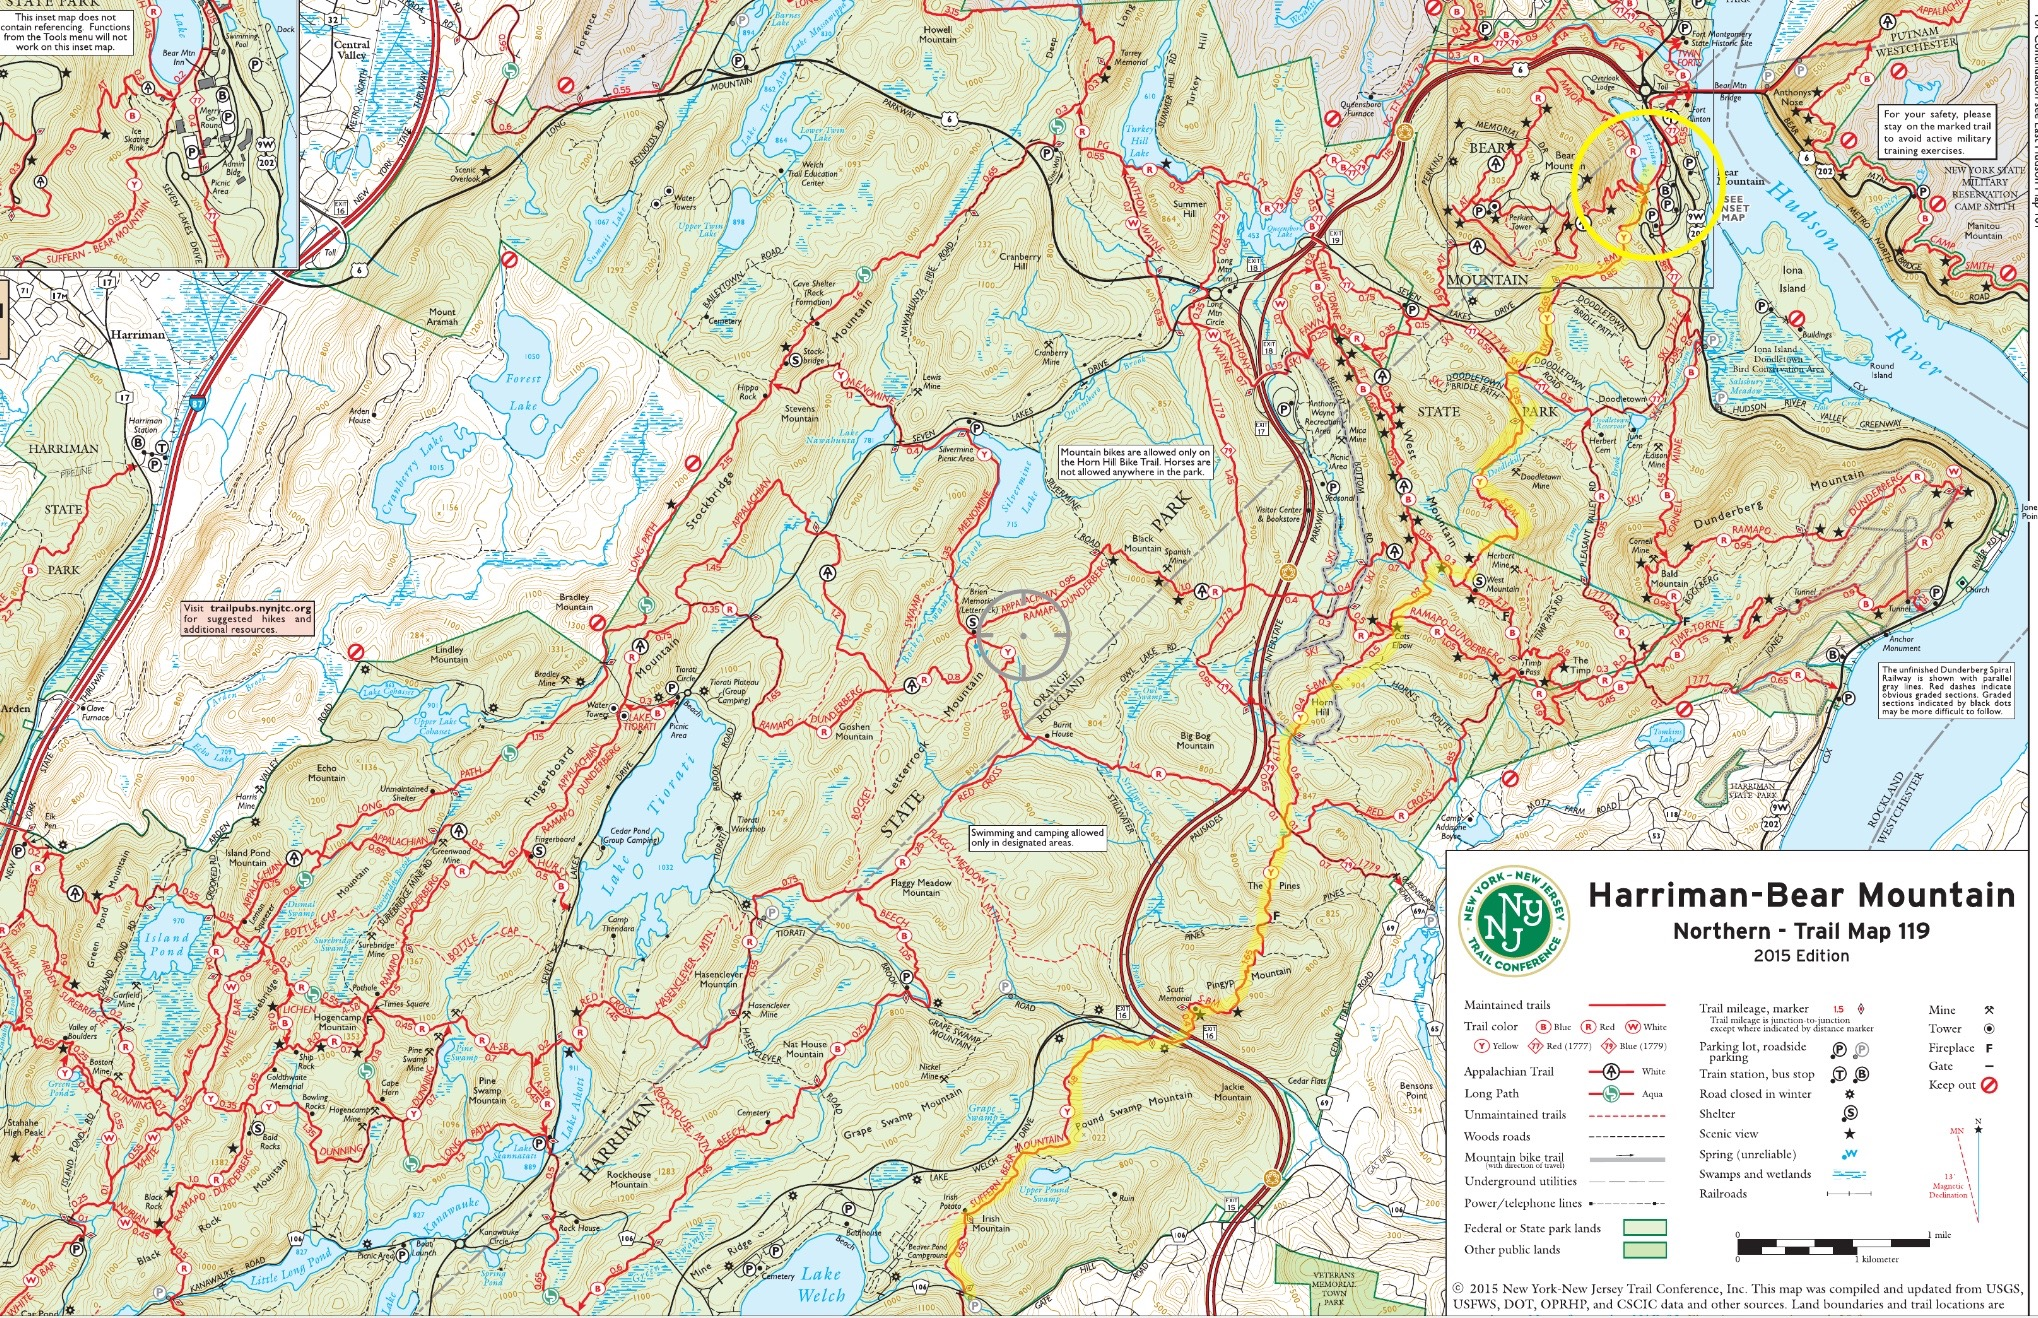 Map 119 Northern HSP & Bear Mountain